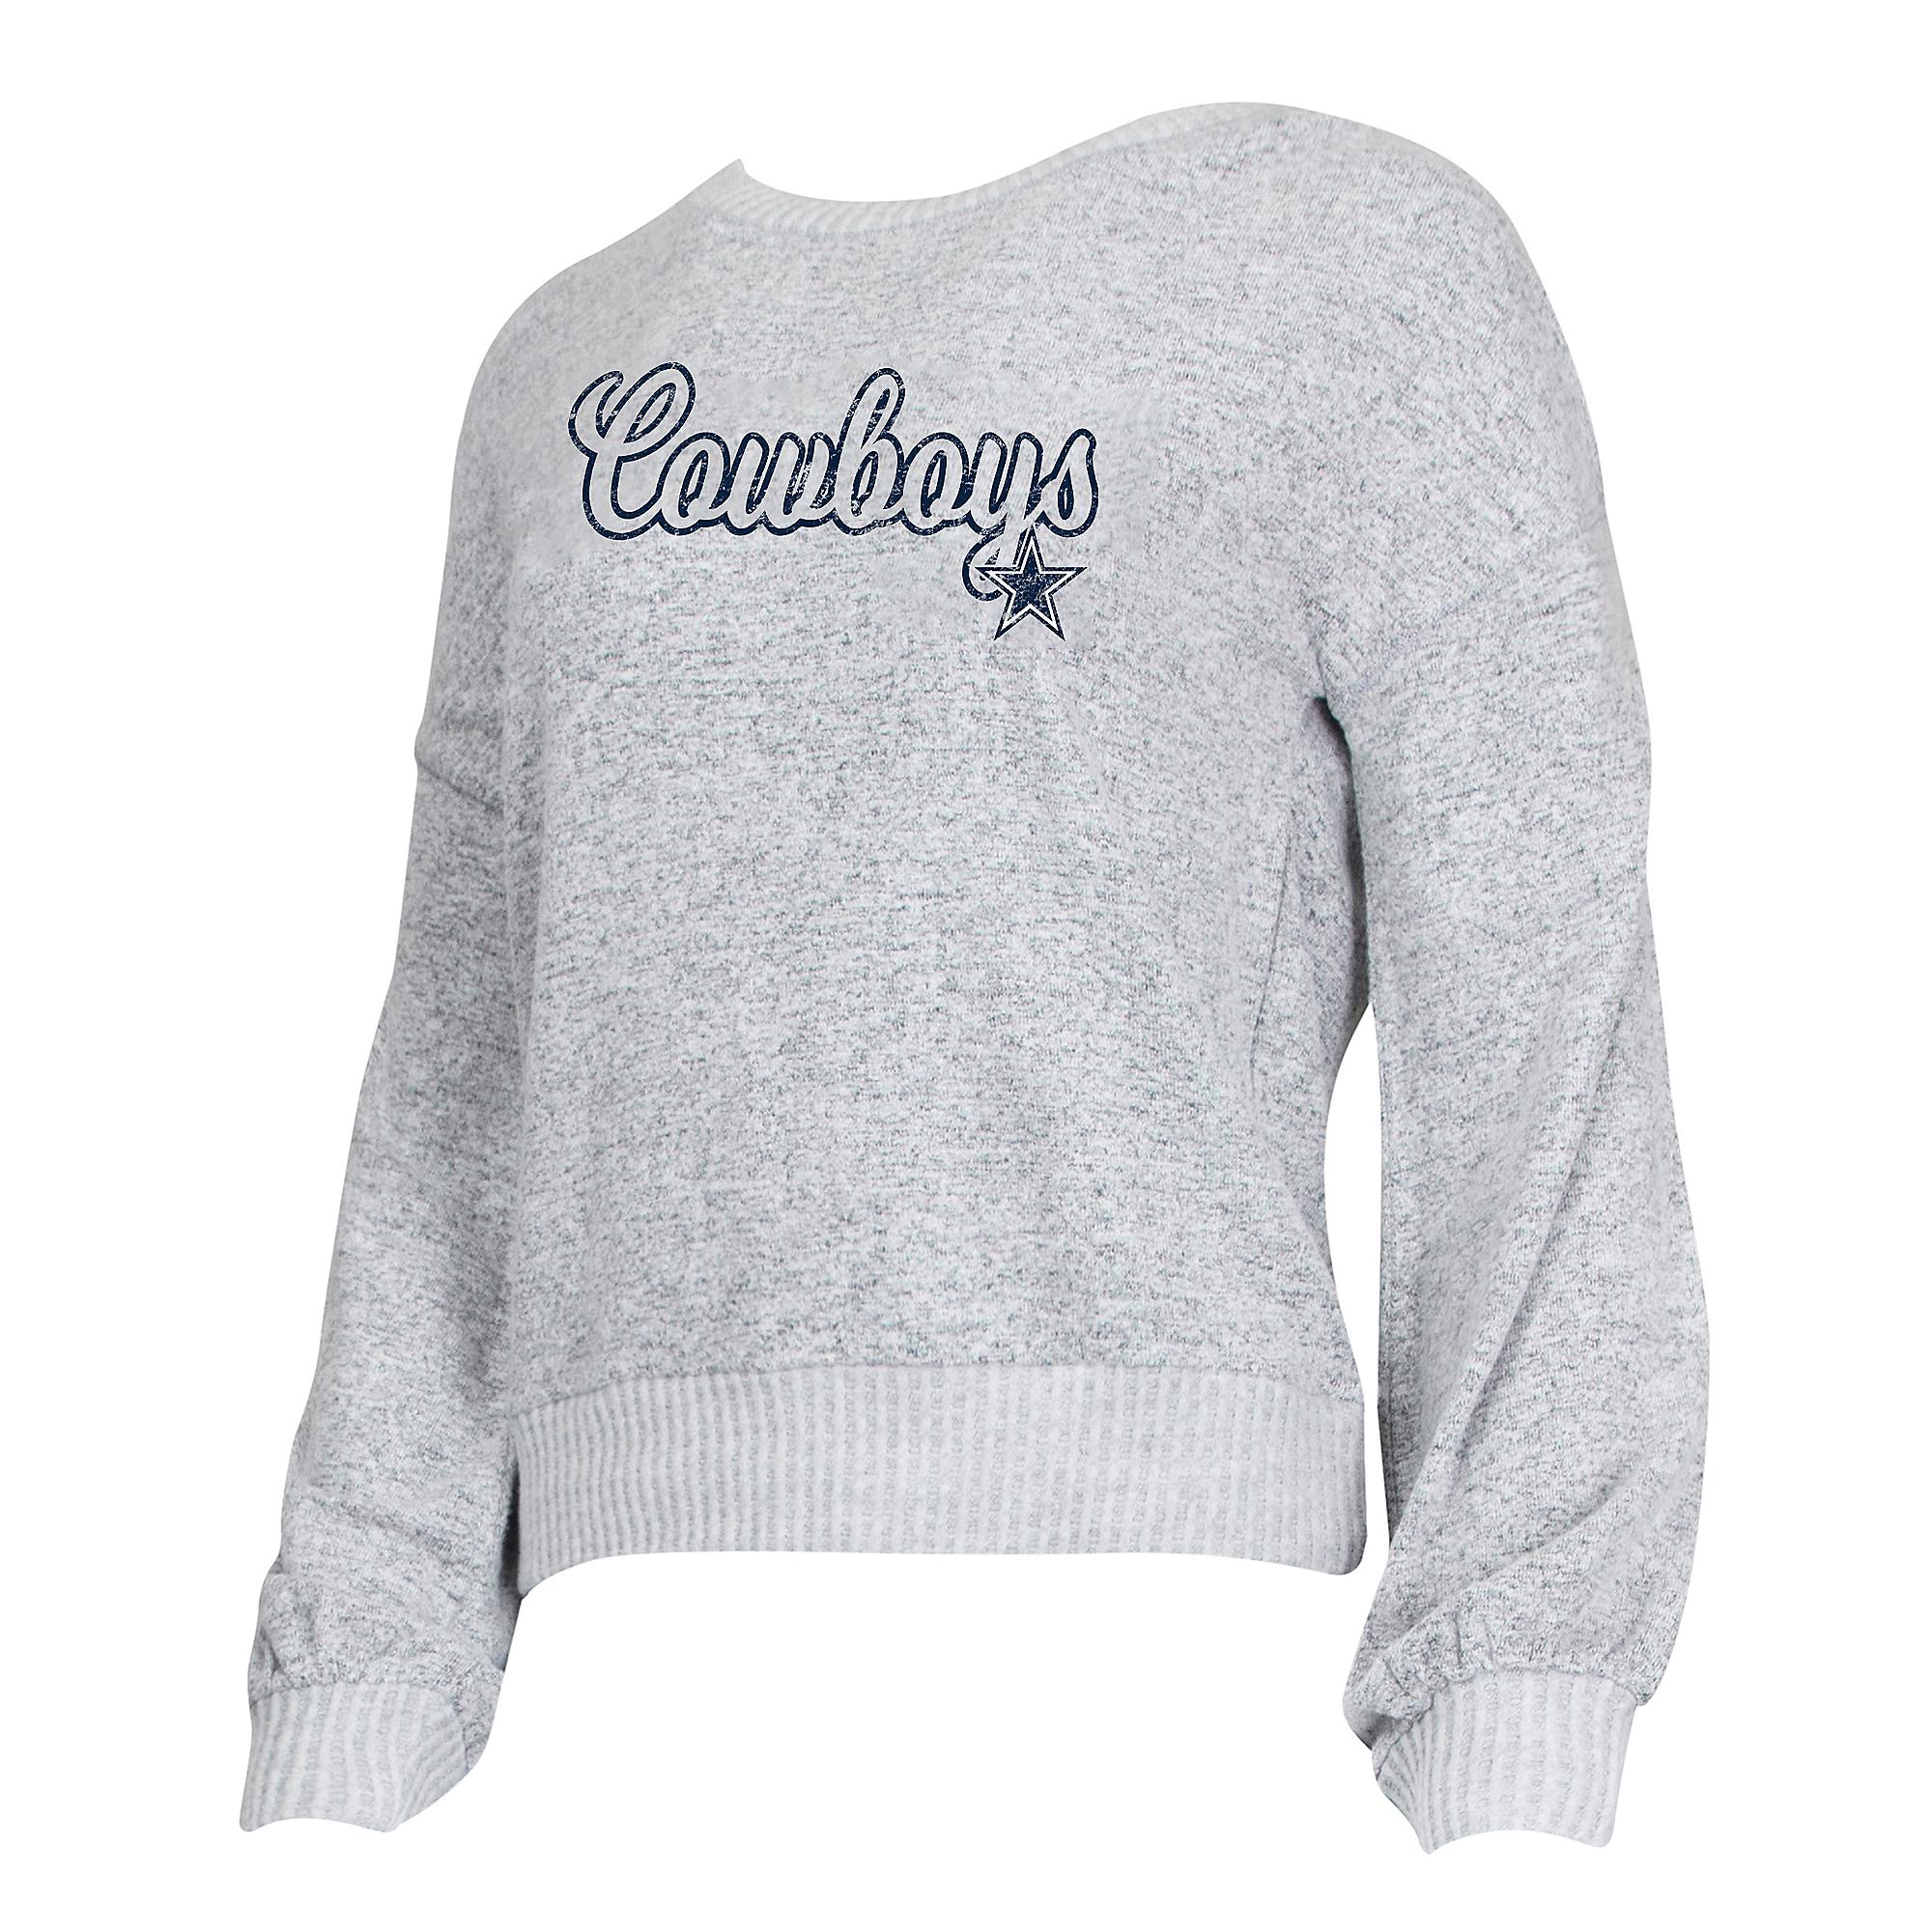 Dallas Cowboys Womens Venture Long Sleeve Knit Crew Sweater